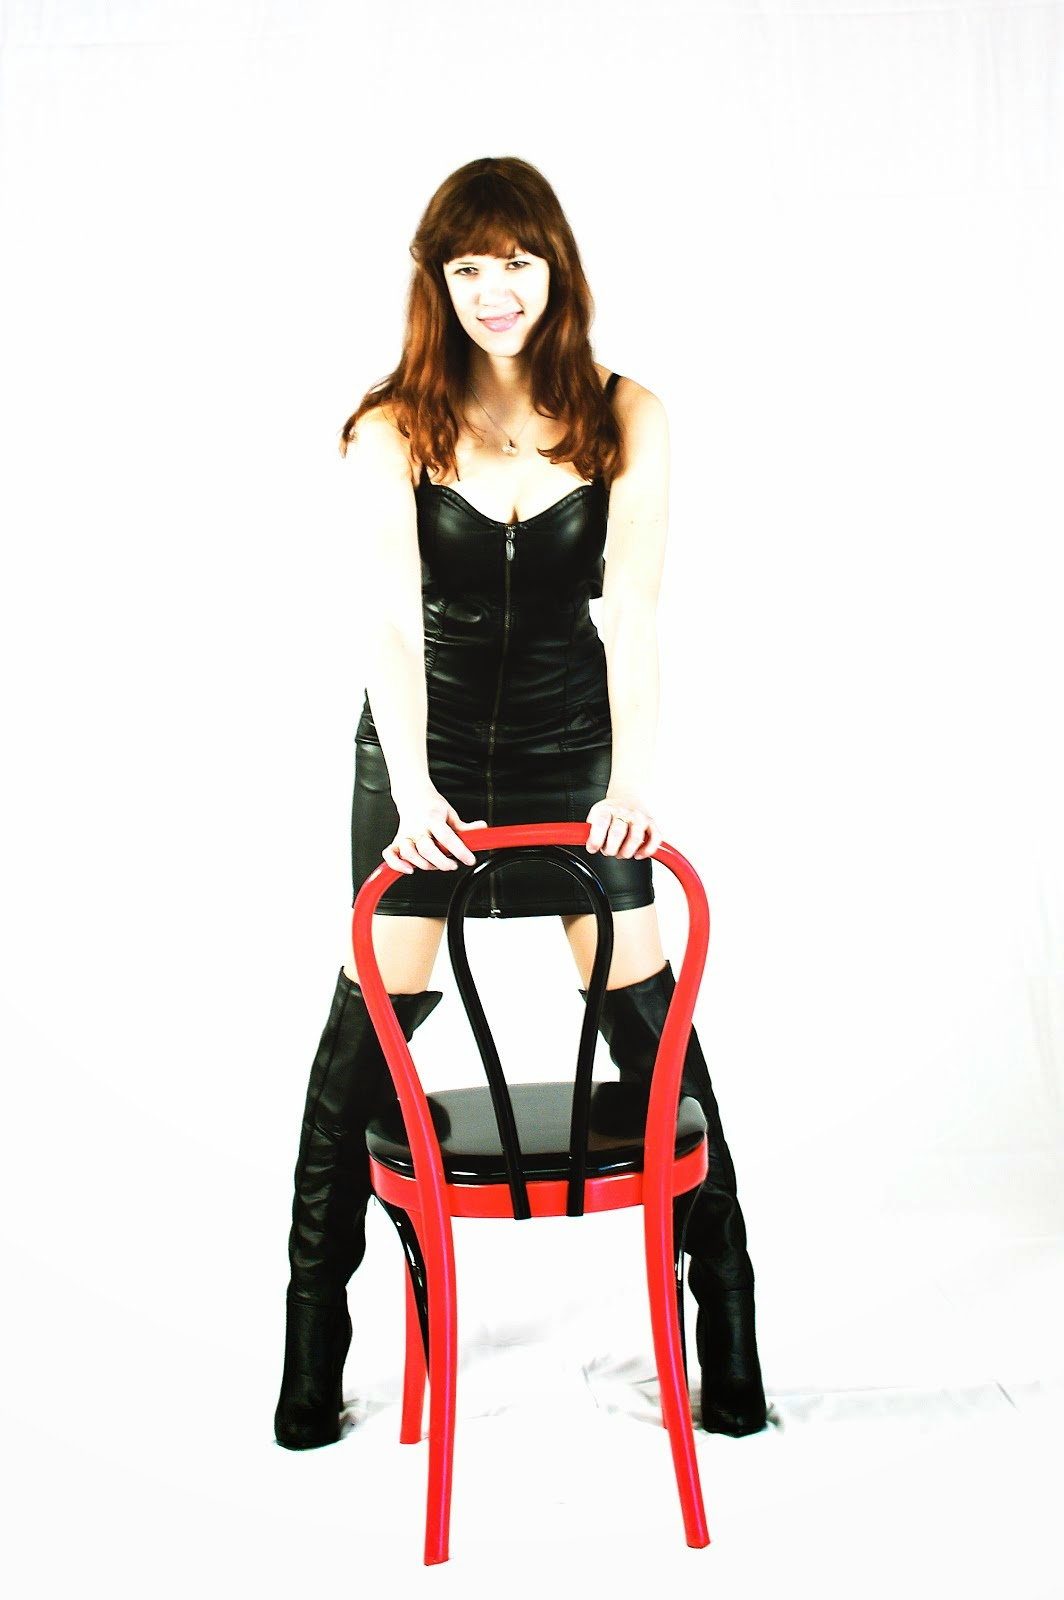 handling chair